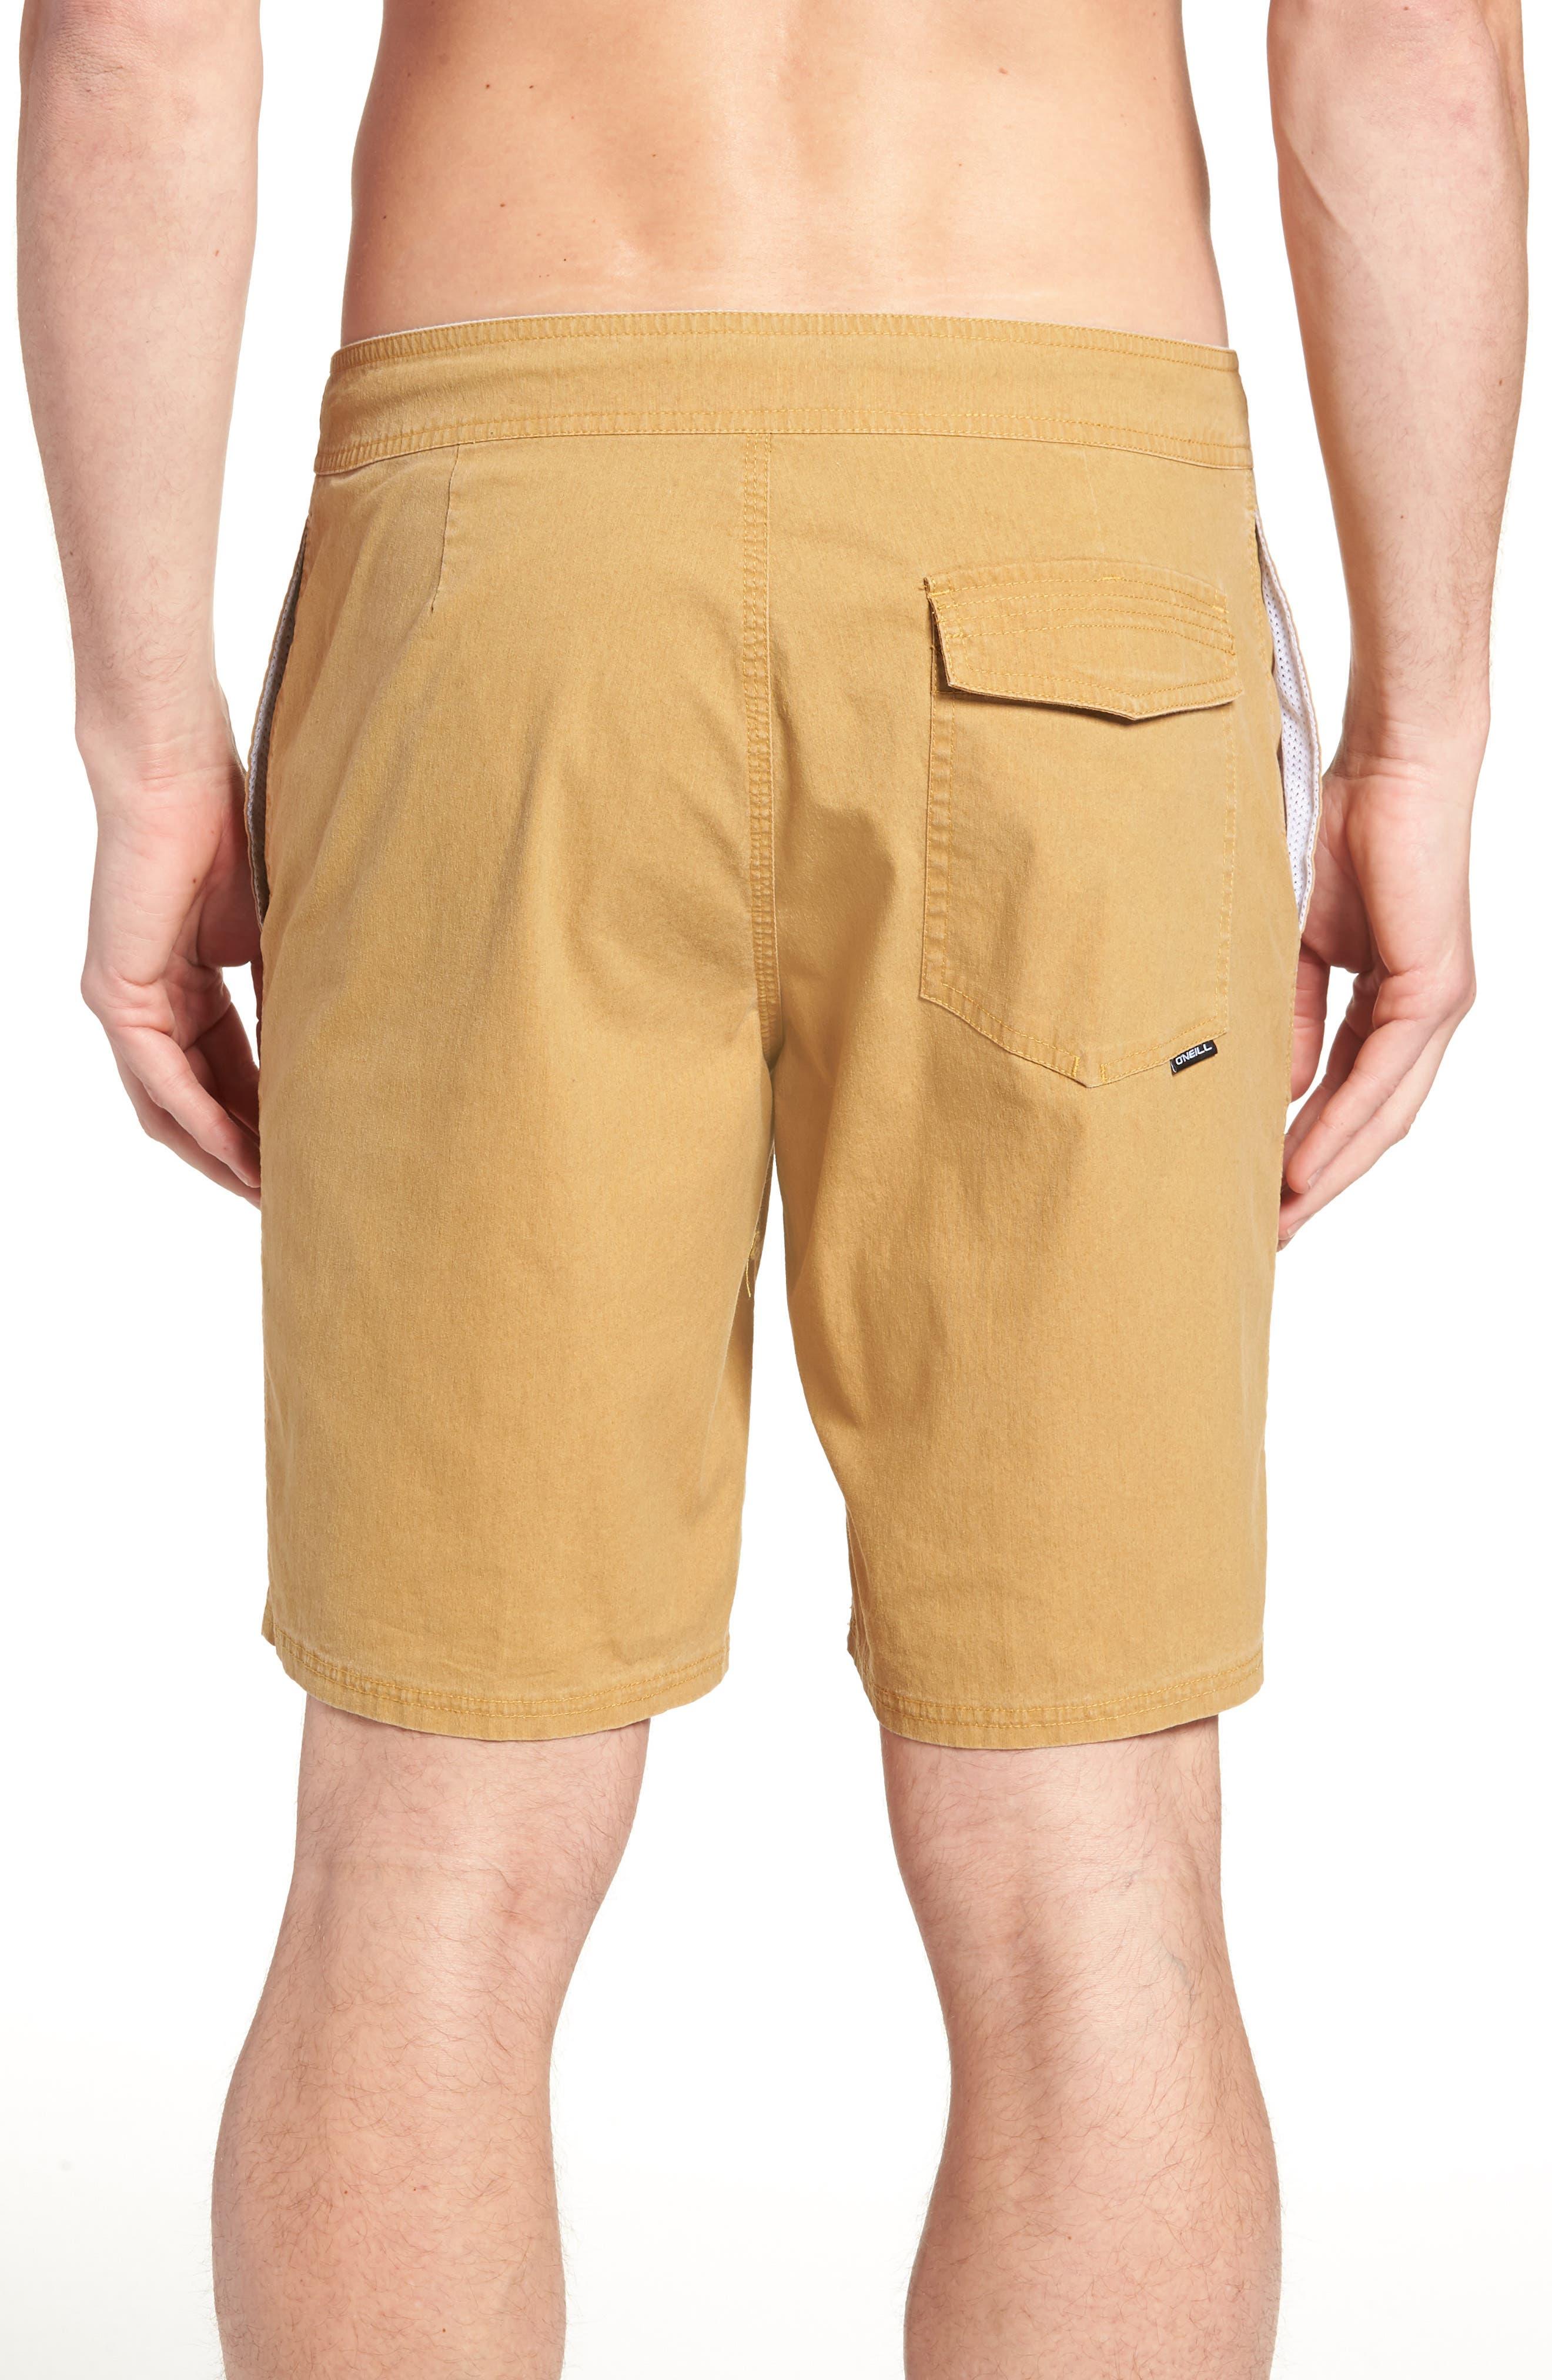 Faded Cruzer Board Shorts,                             Alternate thumbnail 2, color,                             206